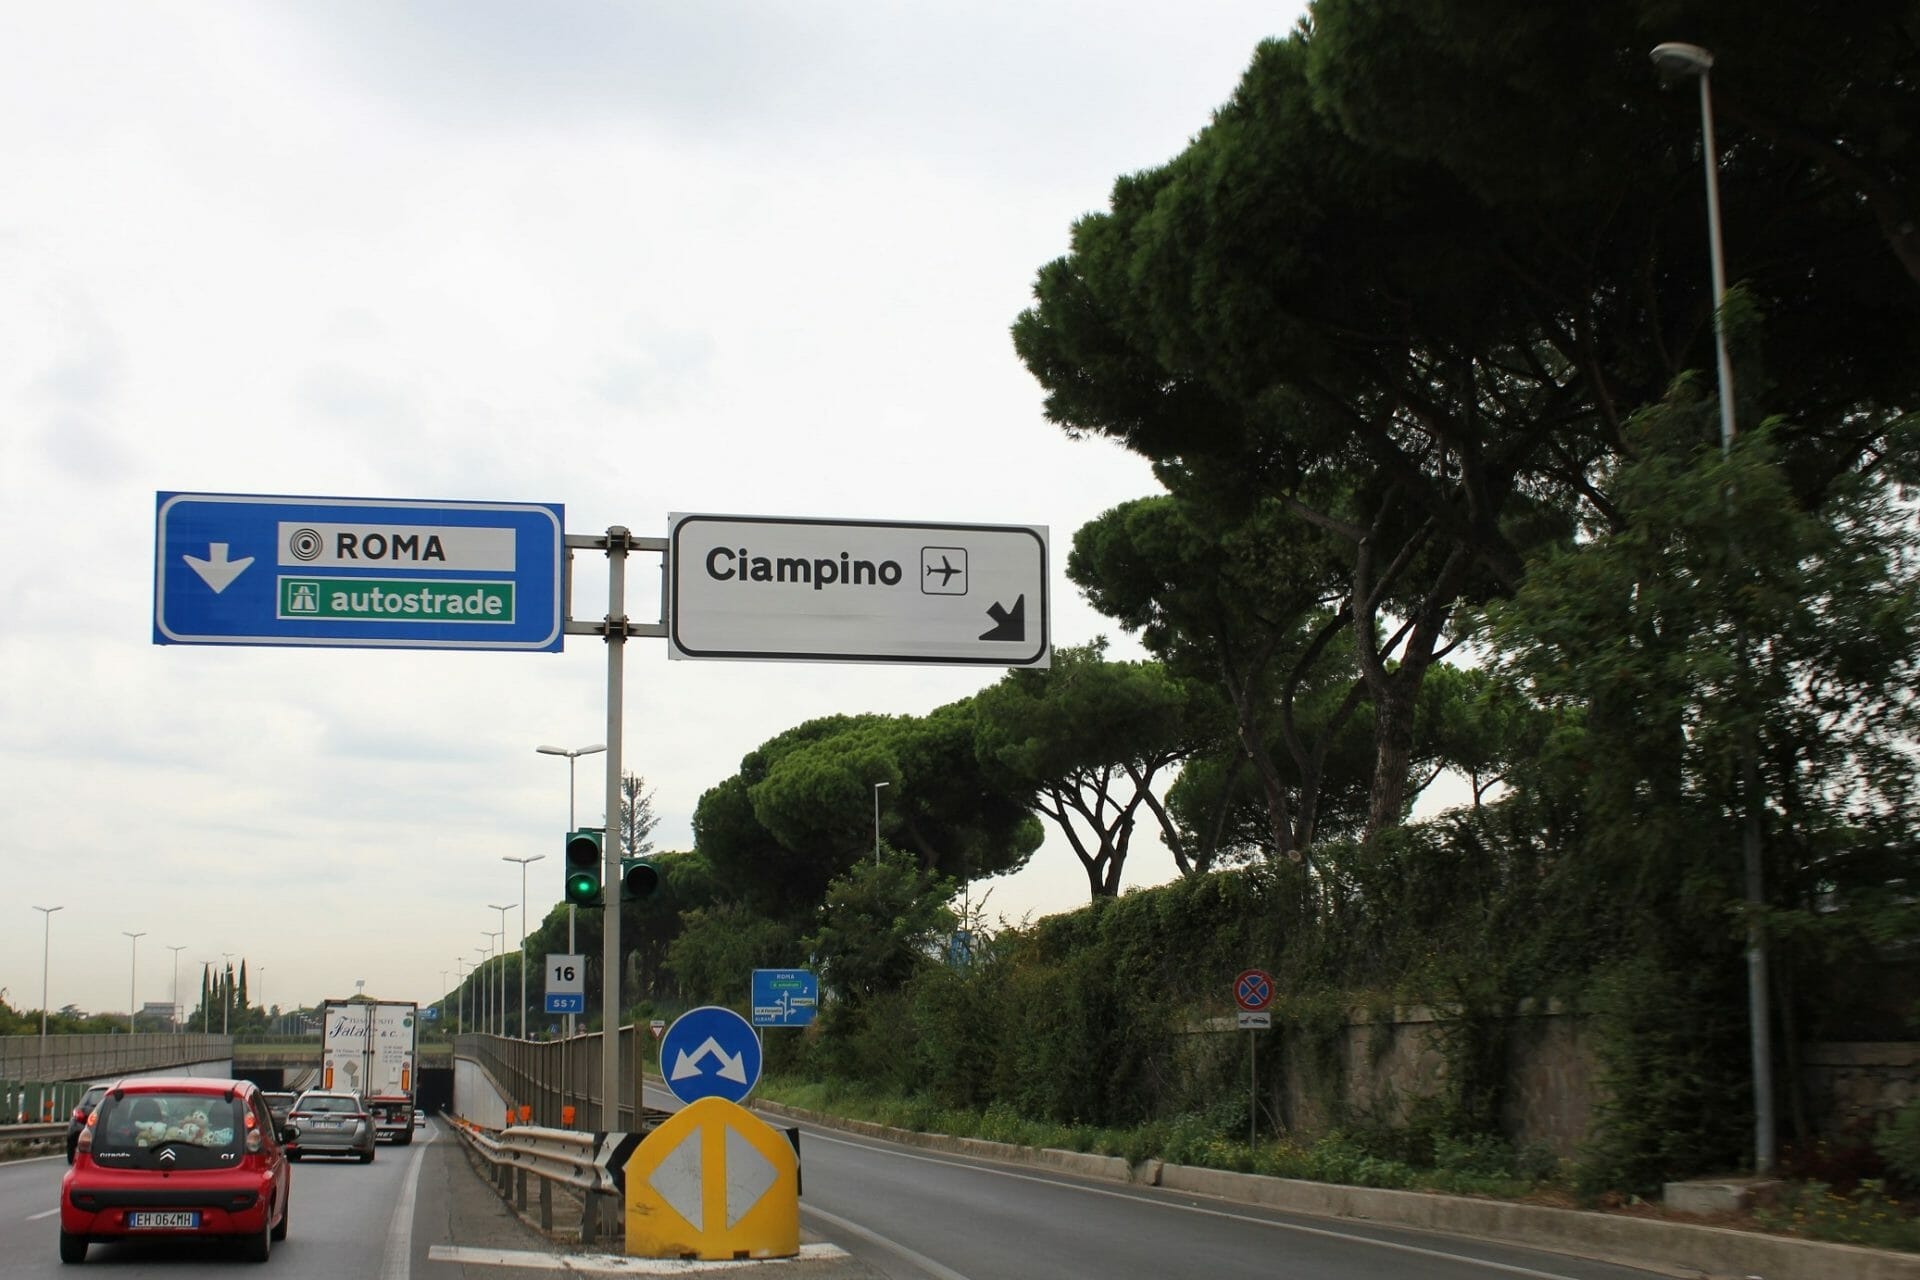 Rome Airport Ciampino road